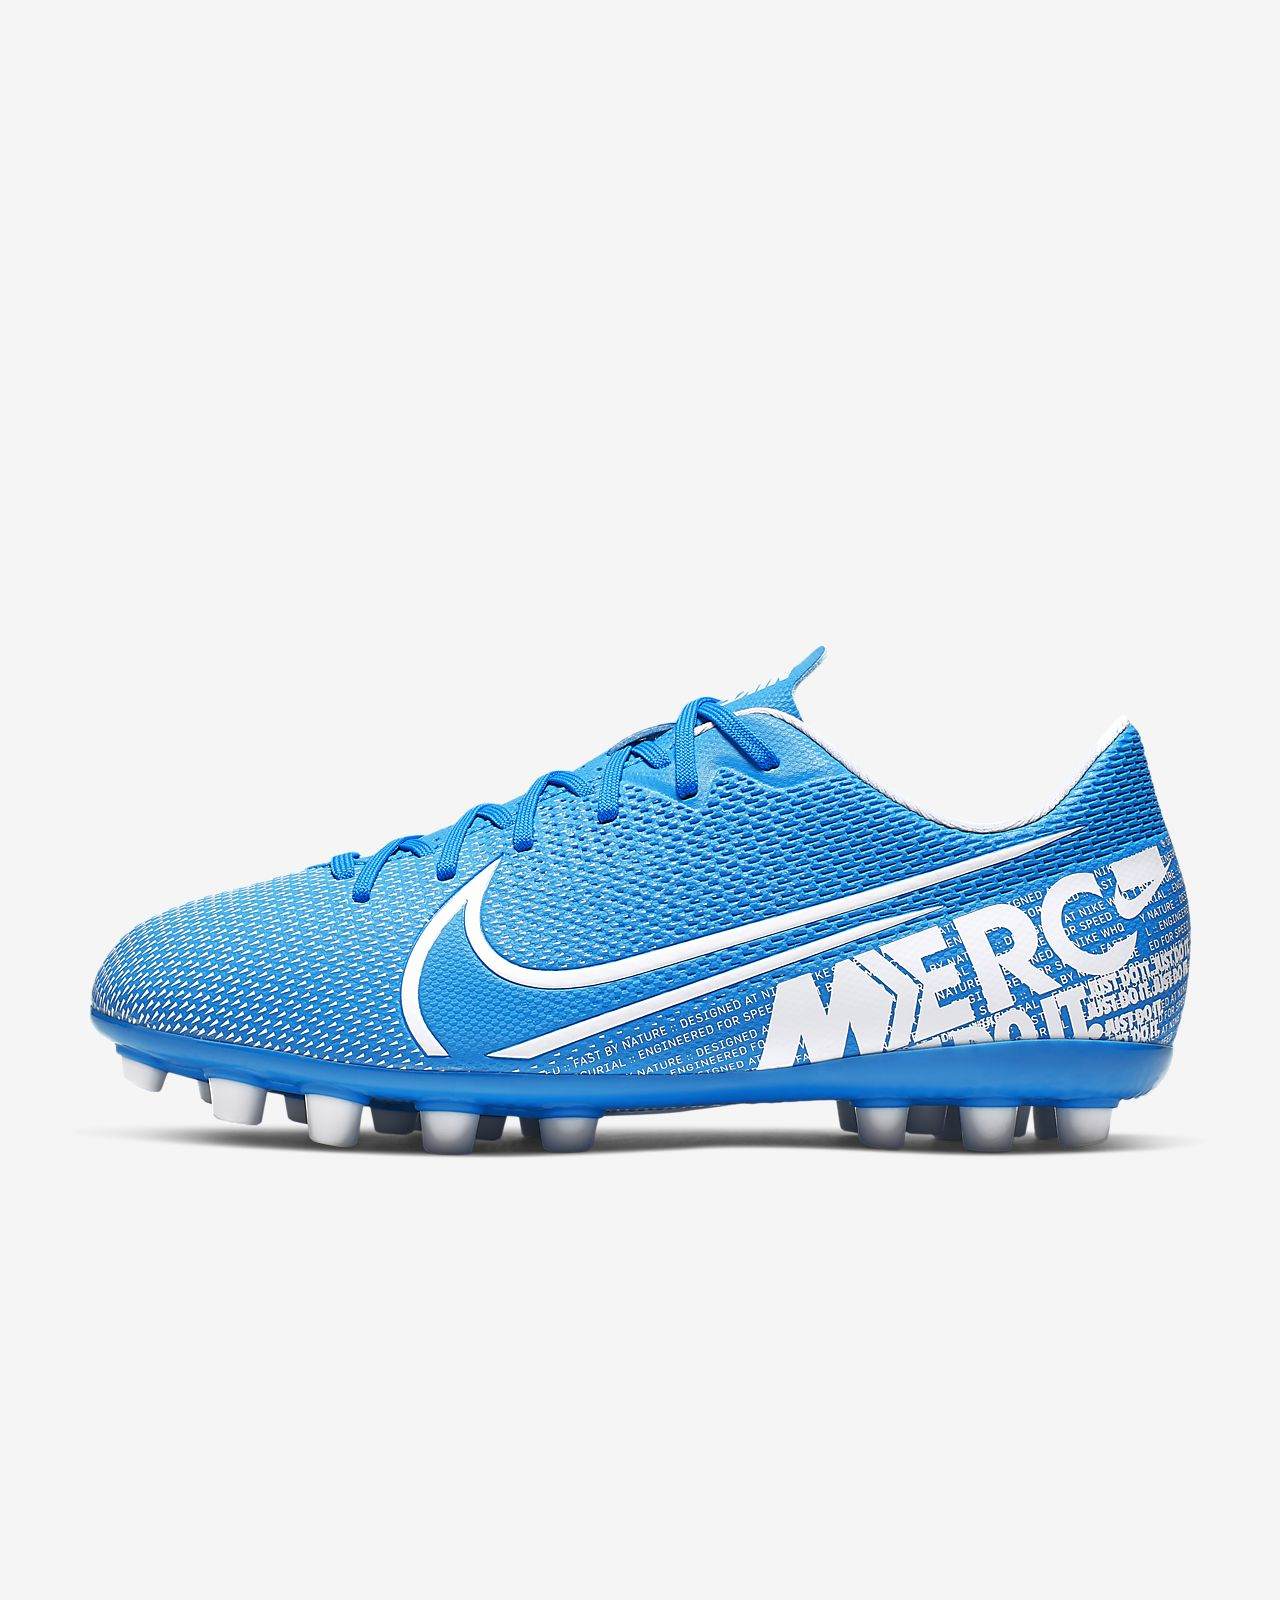 Calzado de fútbol para césped artificial para niños Nike Mercurial Vapor 13 Academy AG